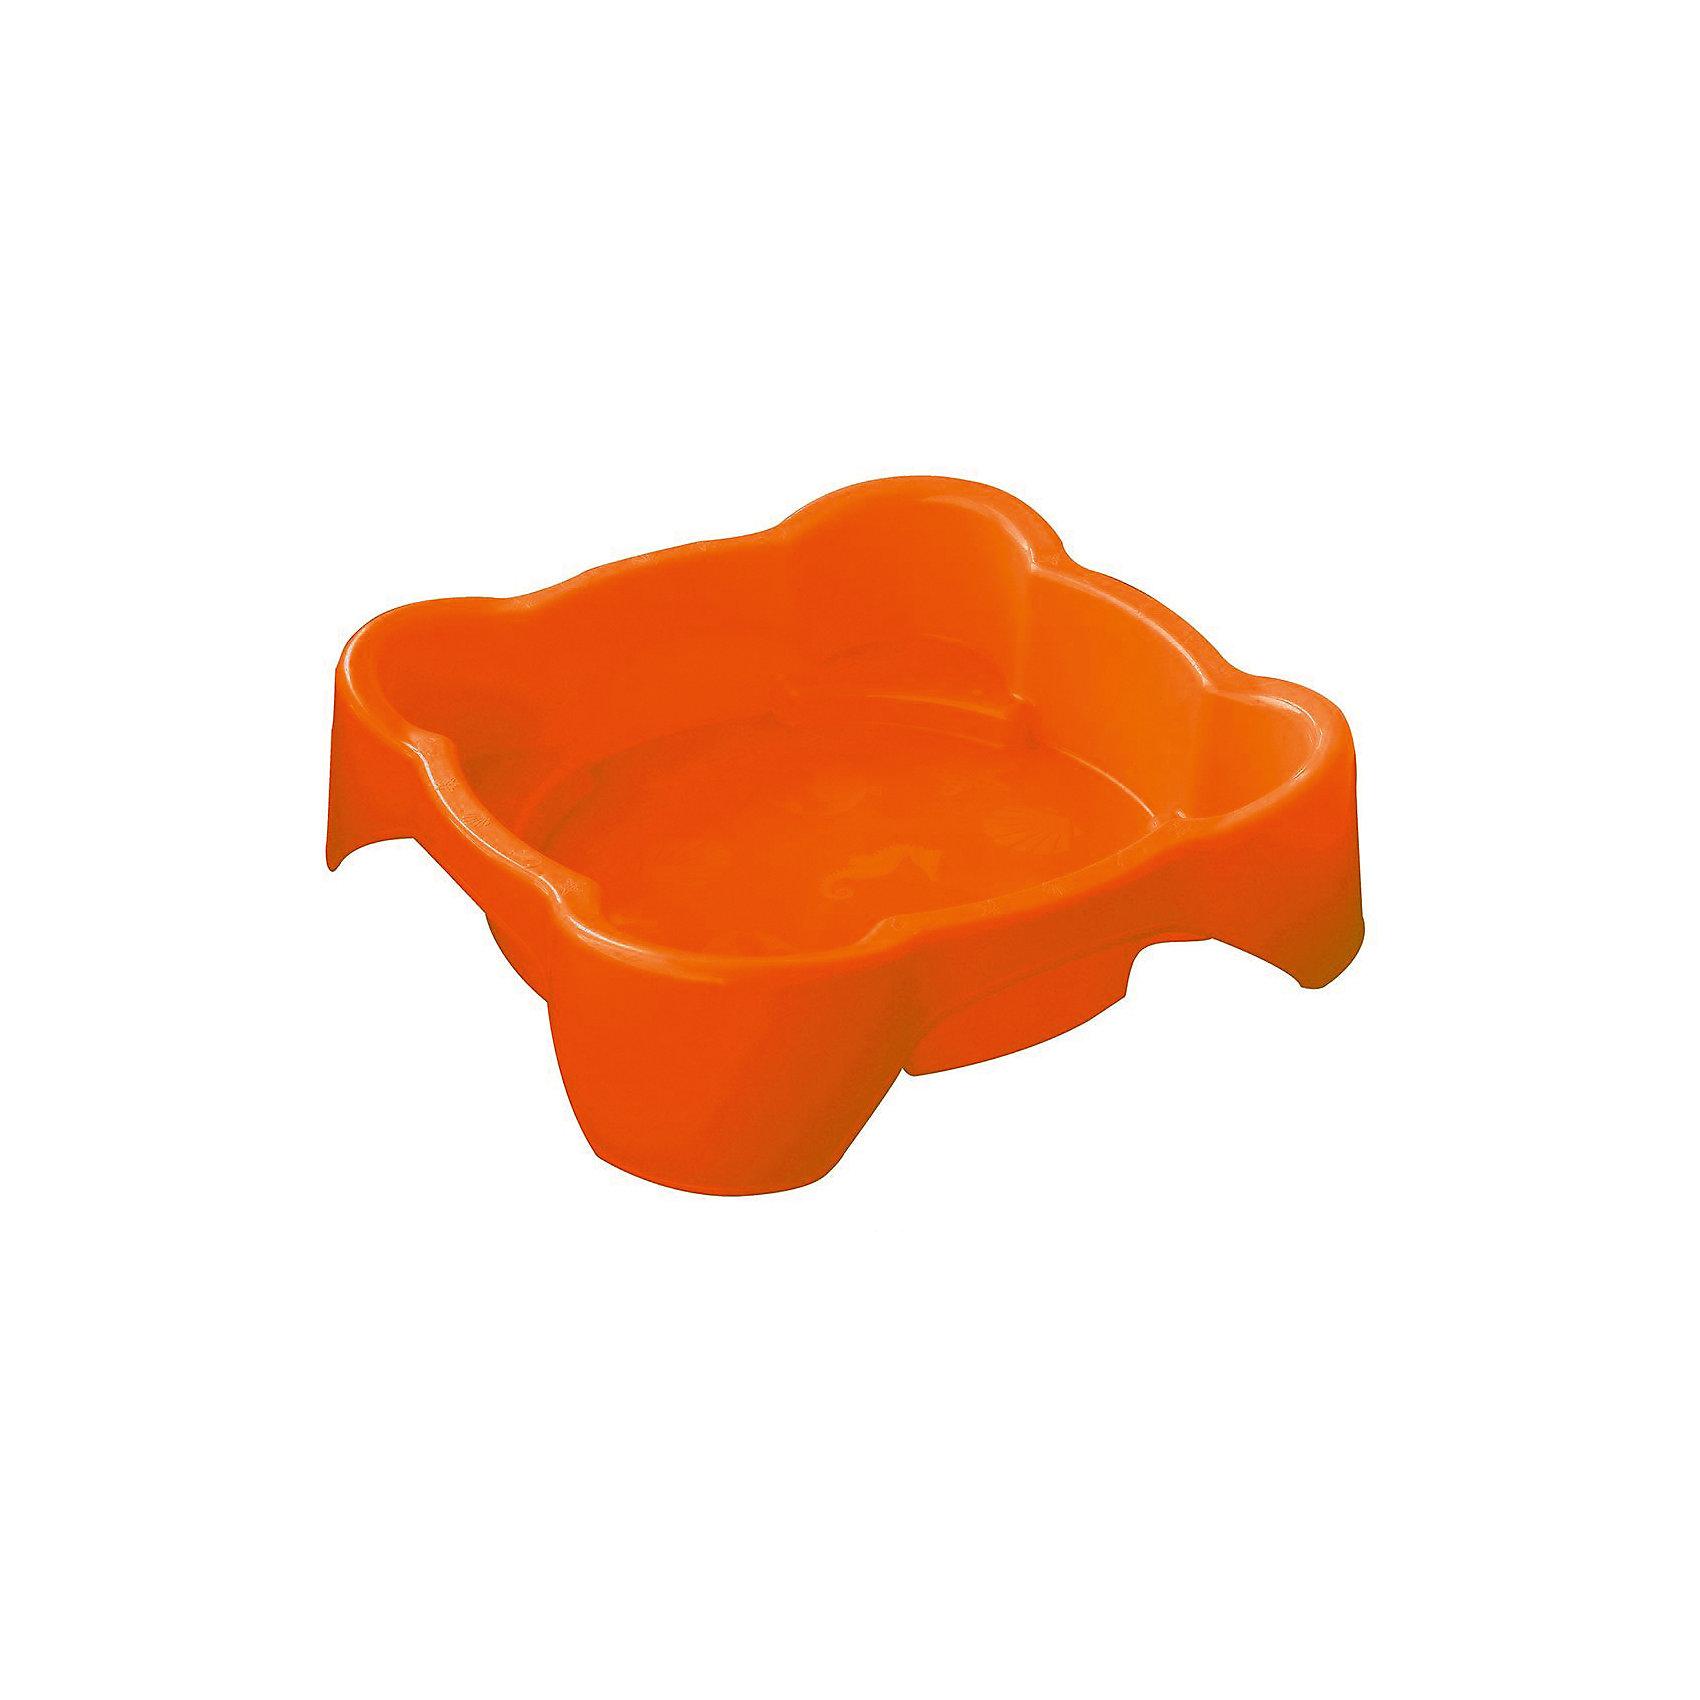 Marianplast Песочница квадратная, оранжевая, Marianplast